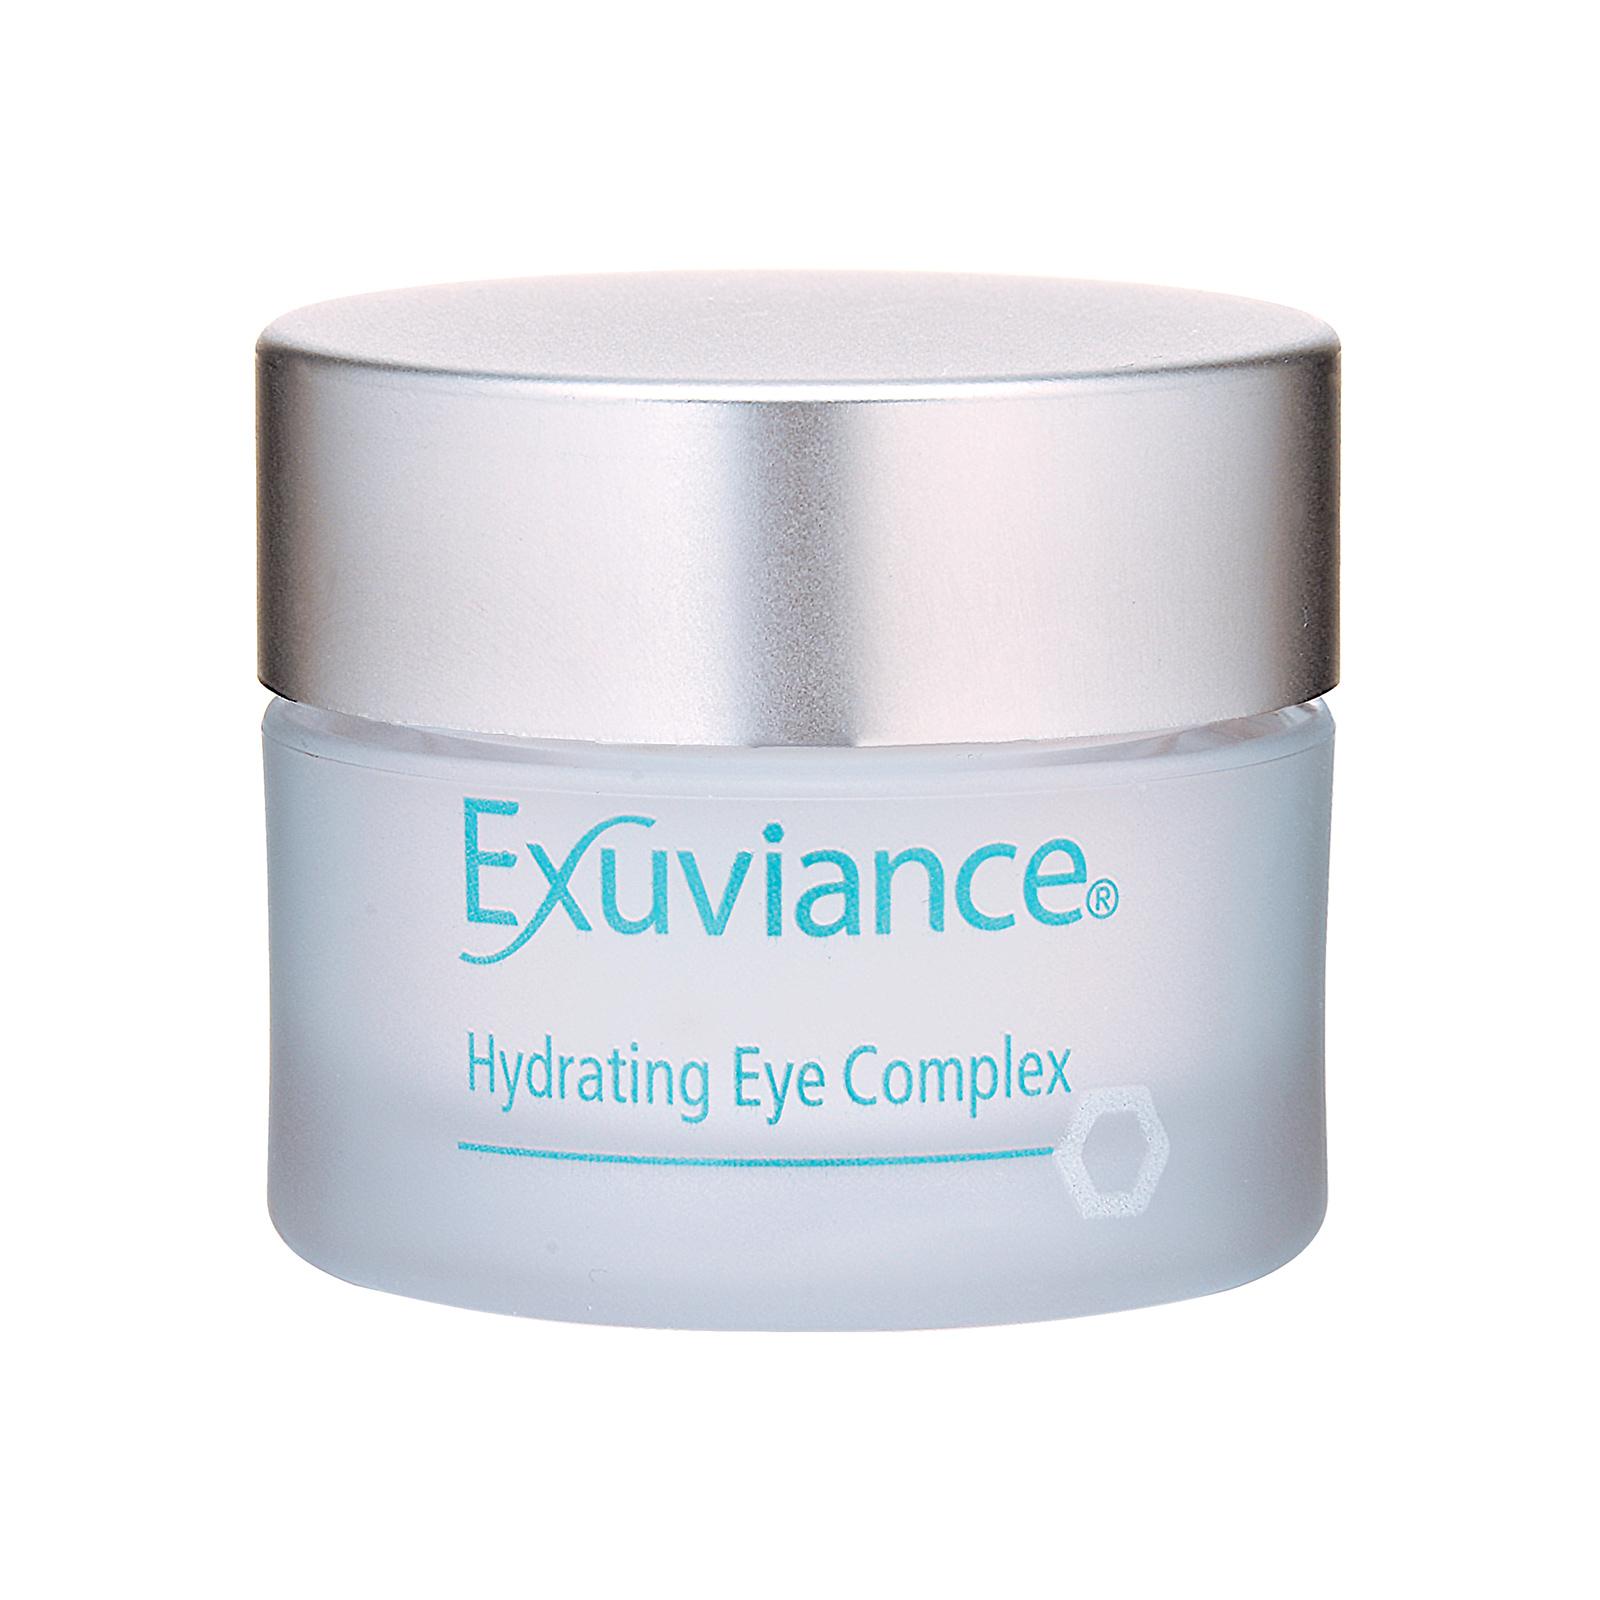 Exuviance  Hydrating Eye Complex 0.5oz, 15g